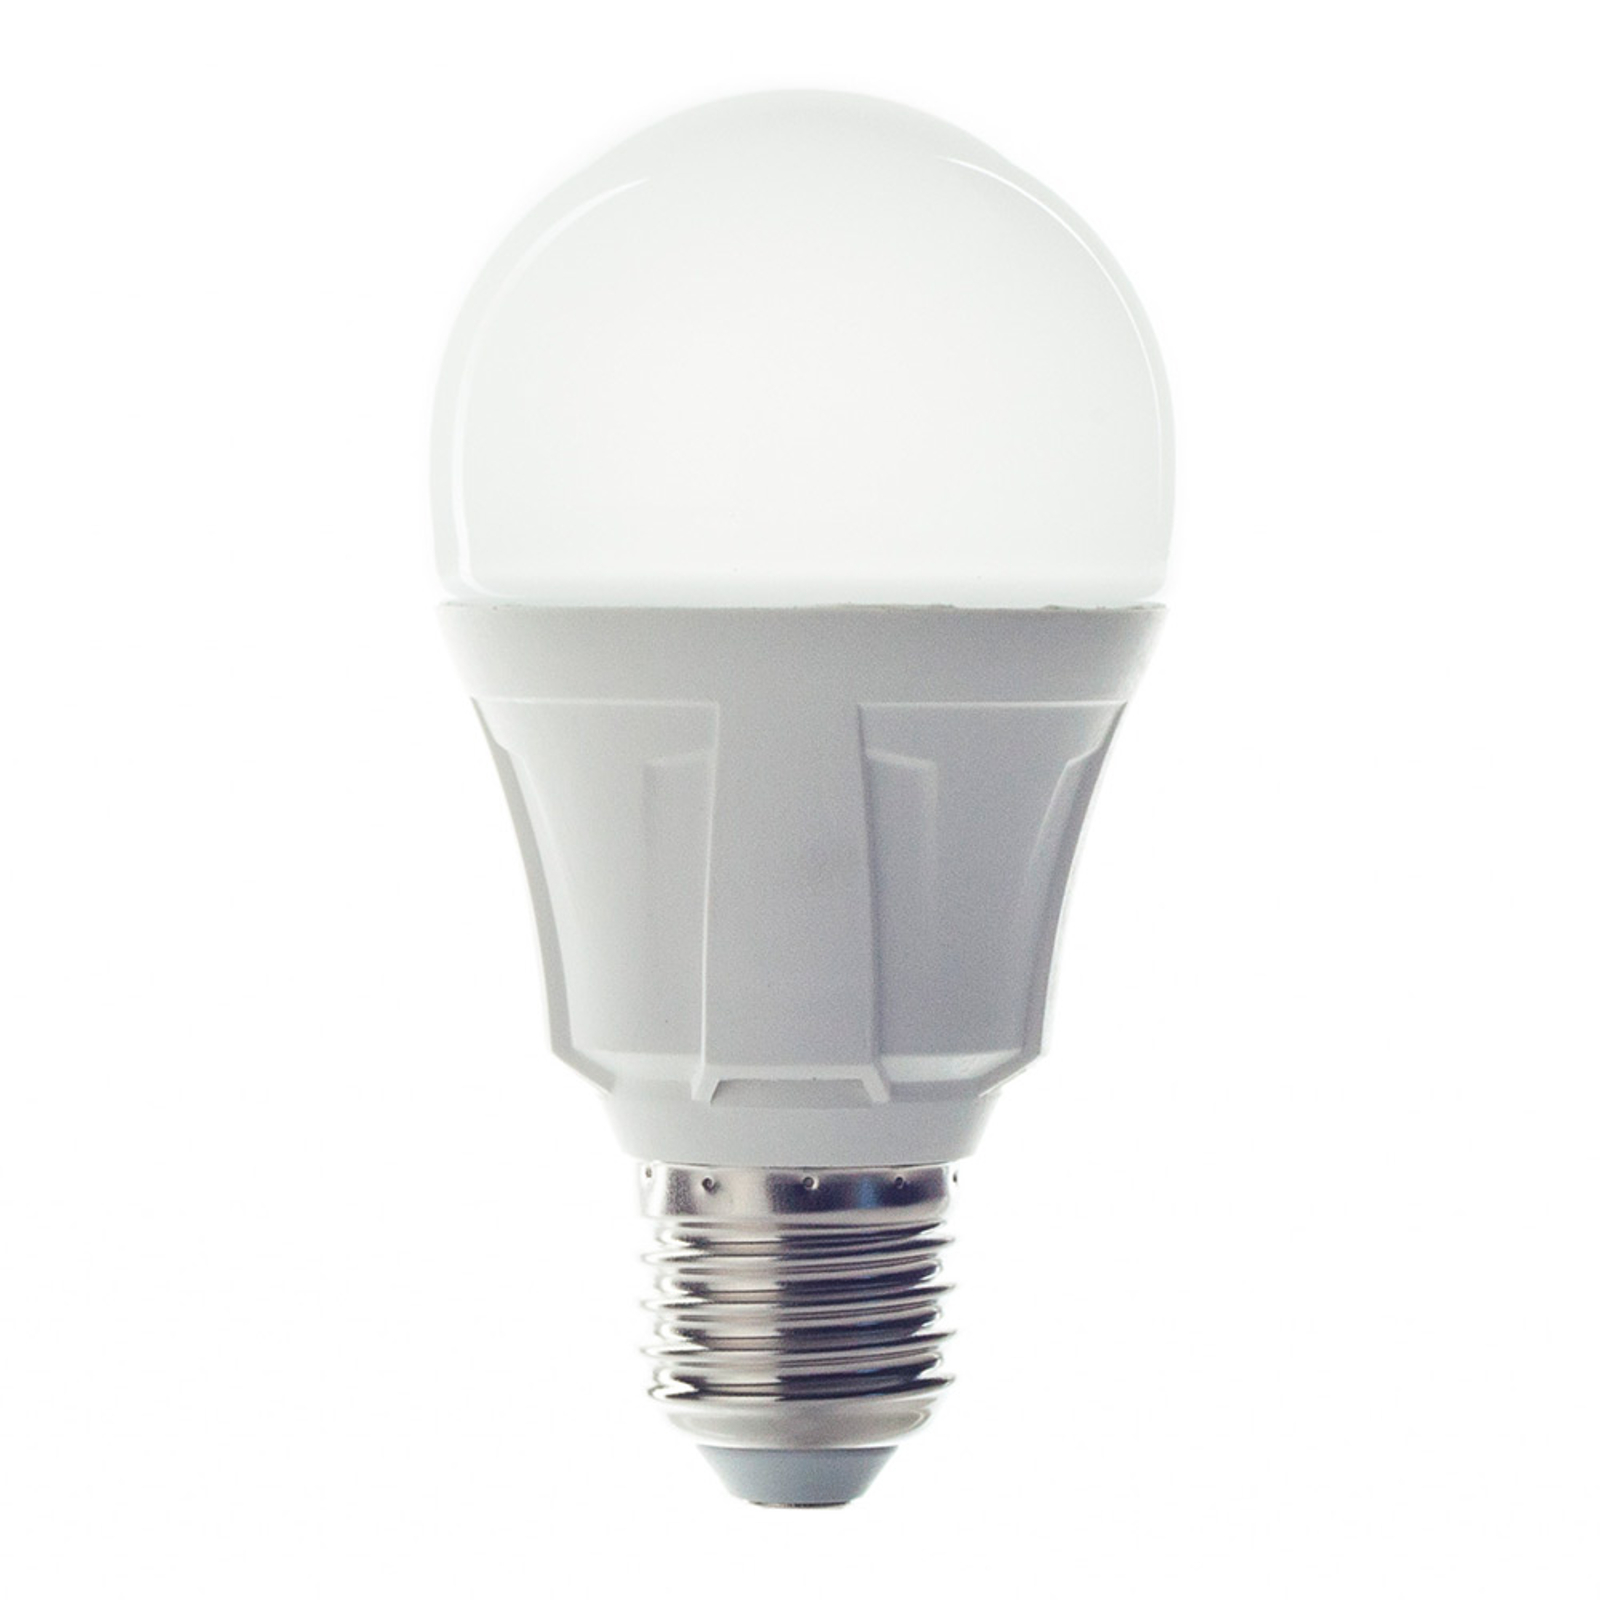 E27 9W 830 LED-Lampe in Glühlampenform warmweiß